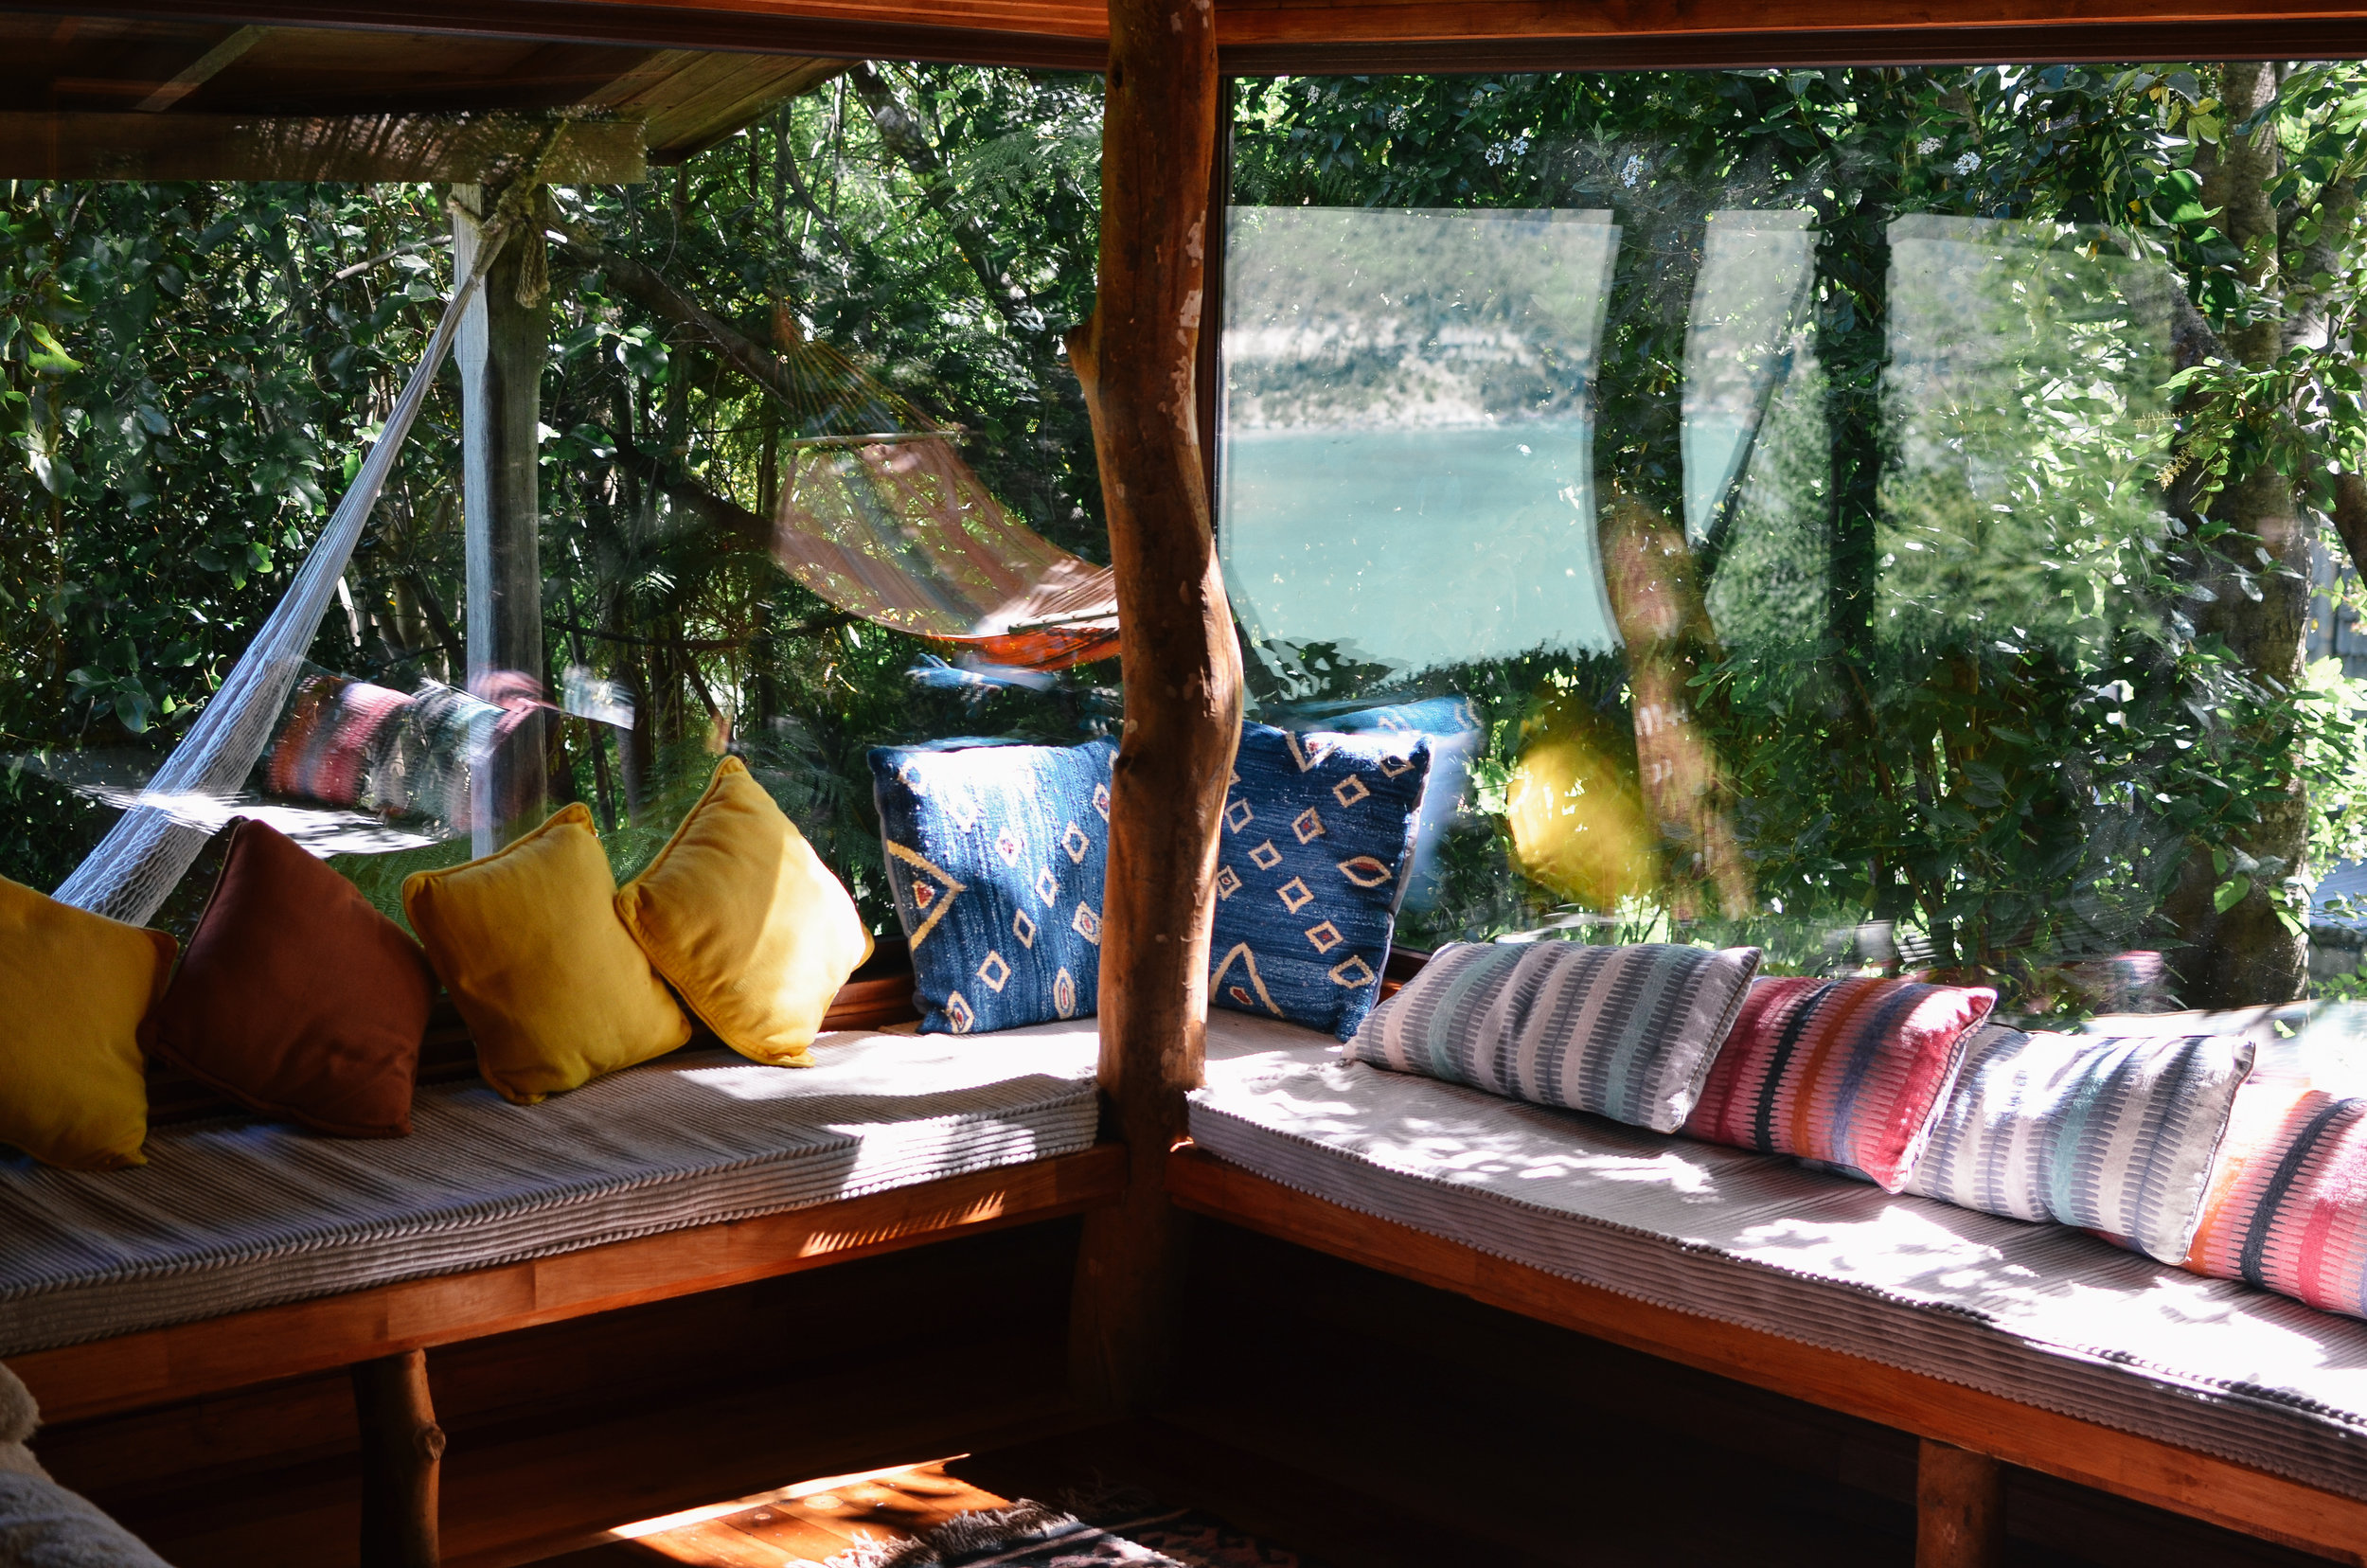 barraco+lodge+chile+life+on+pine+travel+blog+life+on+pine_DSC_1257.jpg